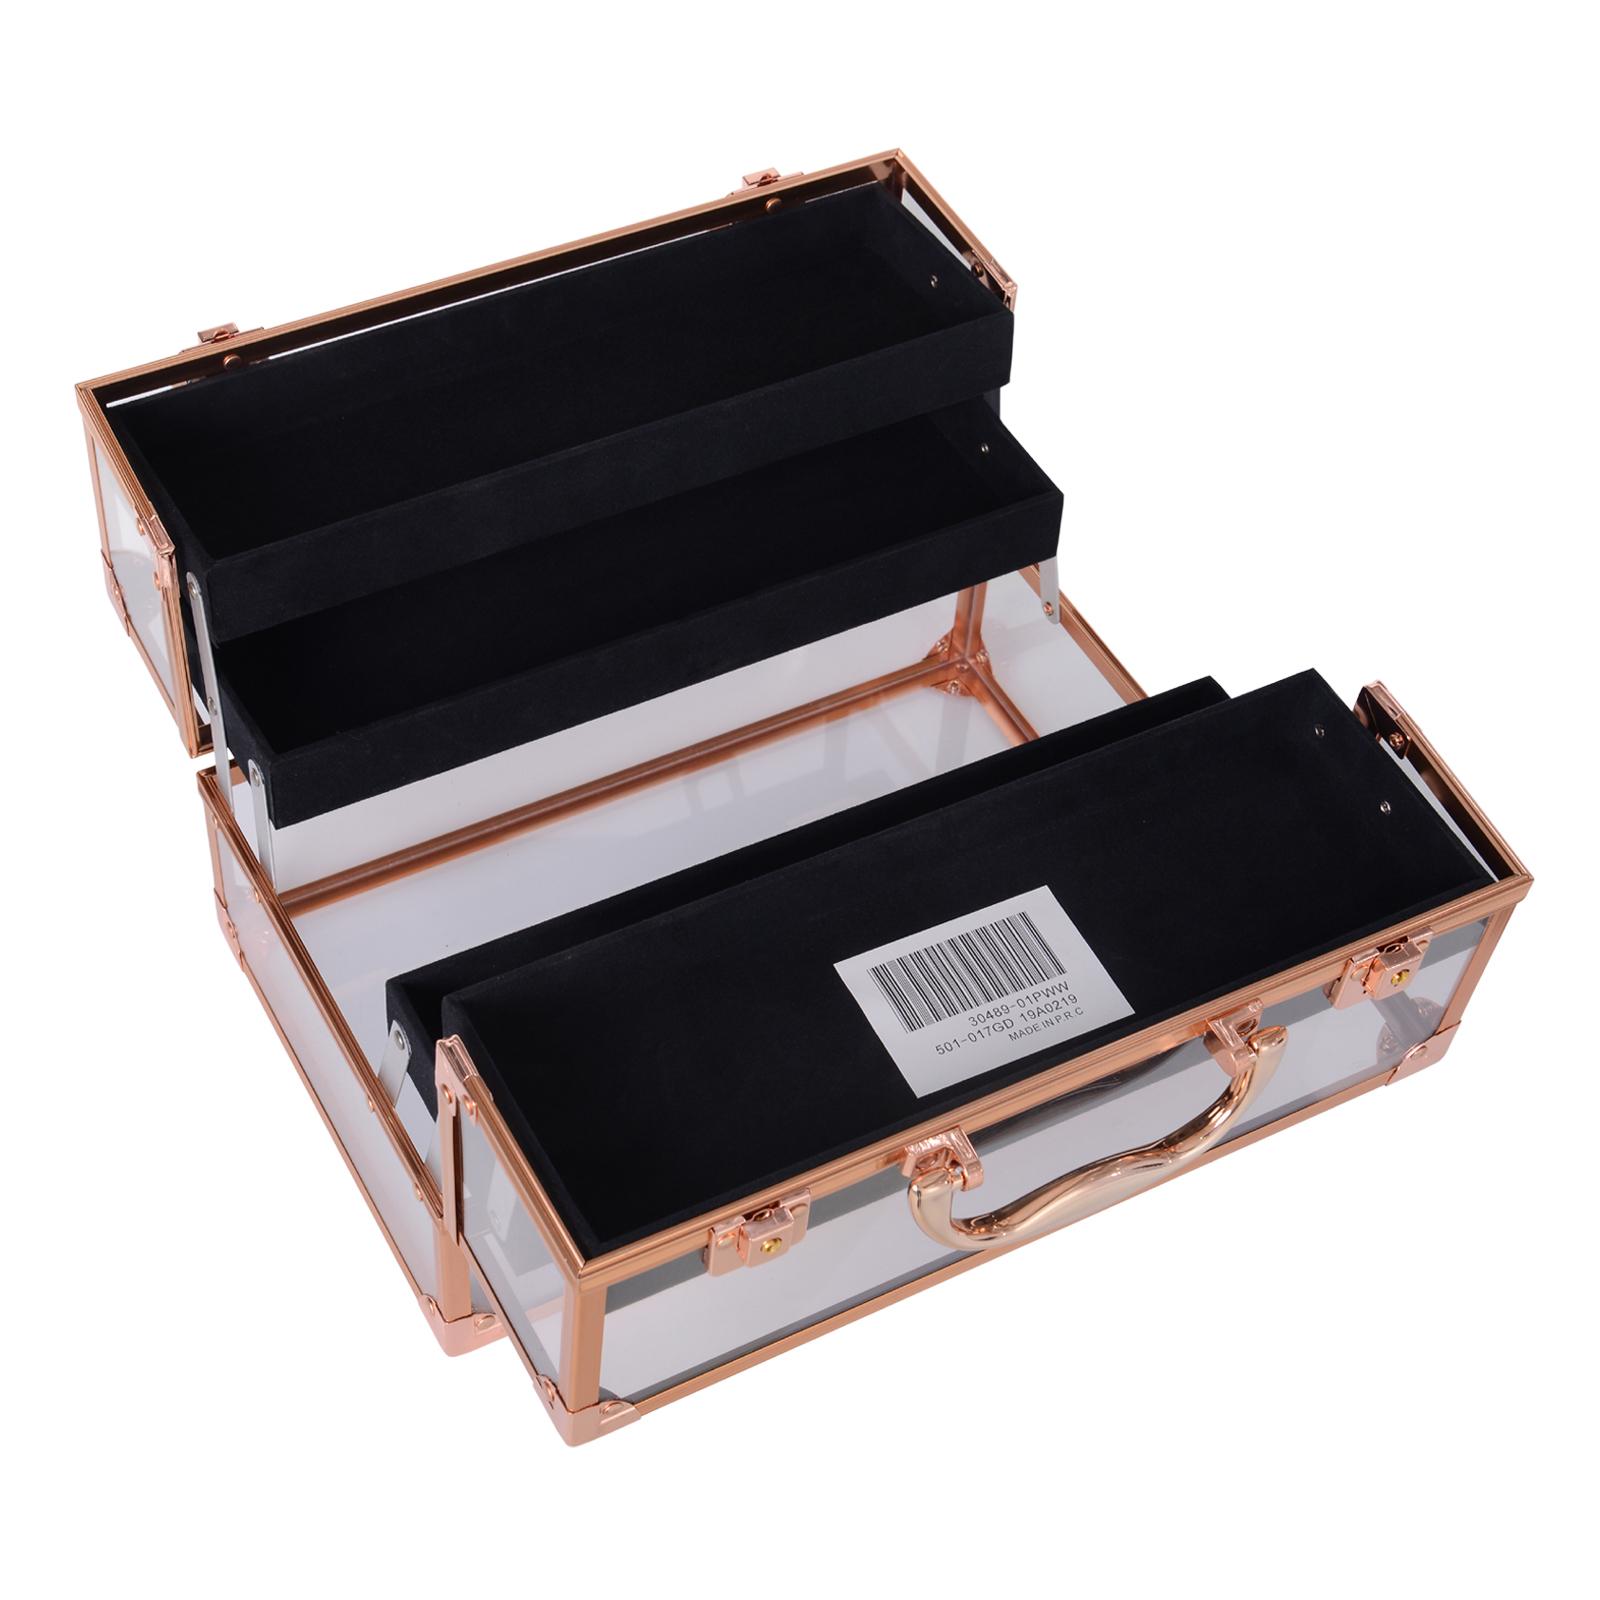 Portable-Makeup-Case-Train-Case-Lockable-Aluminum-with-4-Trays thumbnail 14